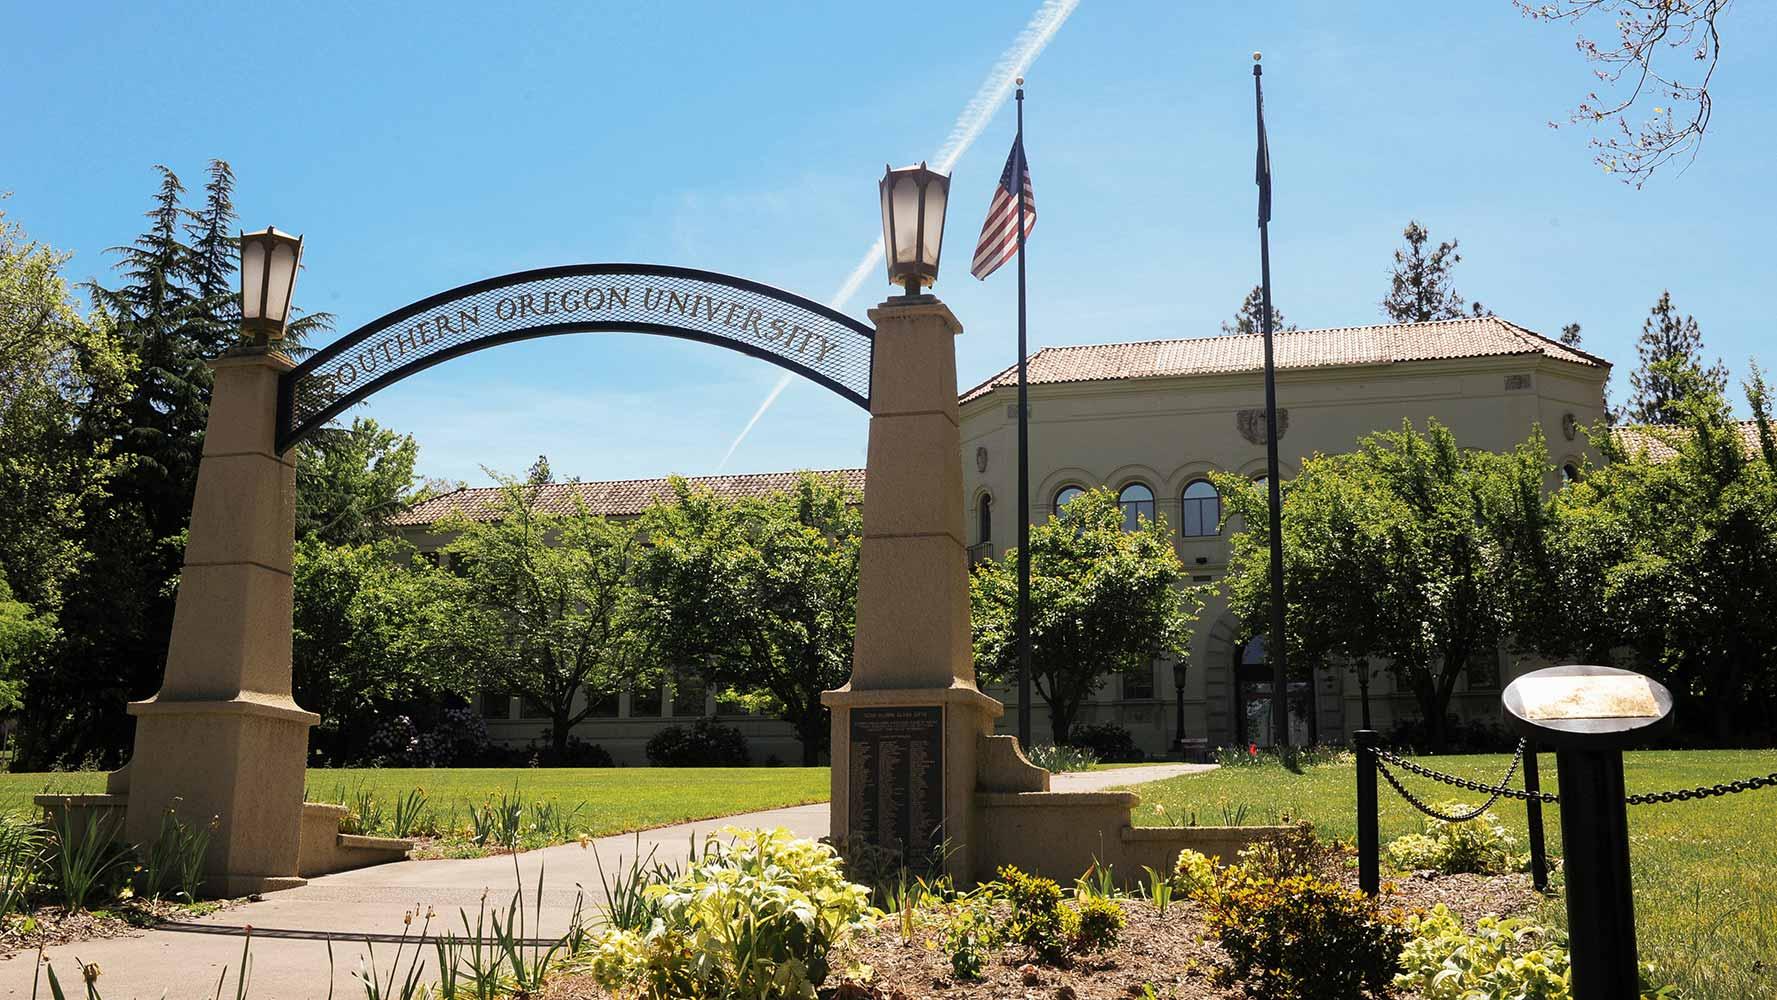 Southern-Oregon-University-Churchill-Hall-Summer-2016.jpg